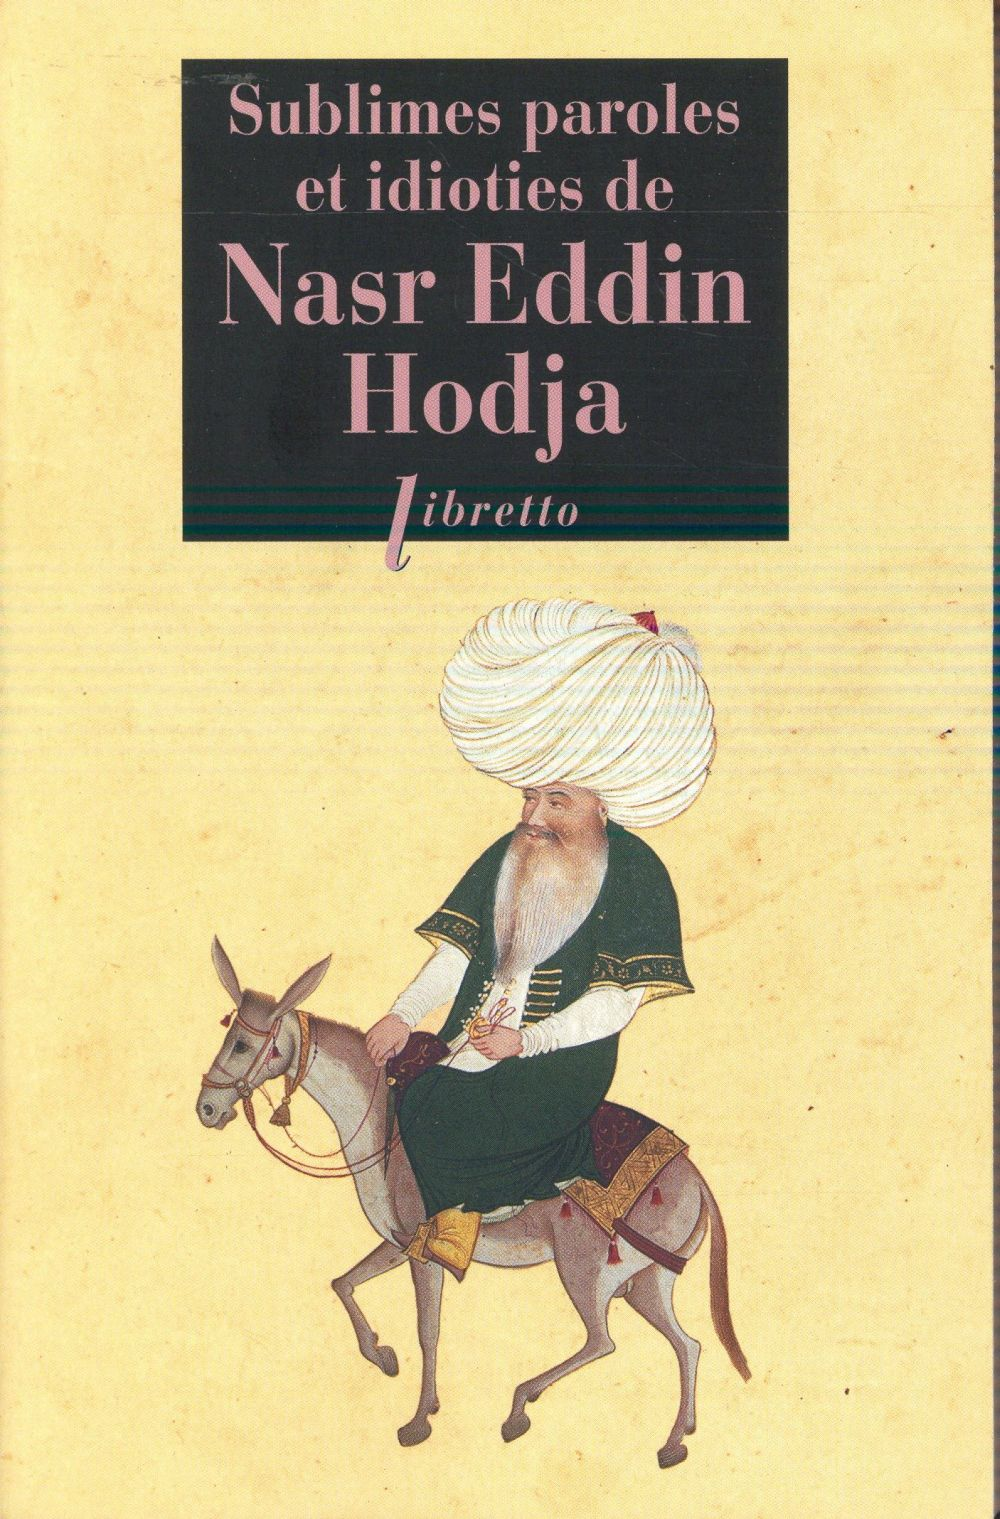 SUBLIMES PAROLES ET IDIOTIES DE NASR EDDIN HODJA  -  TOUT NASR EDDIN, OU PRESQUE ANONYME PHEBUS